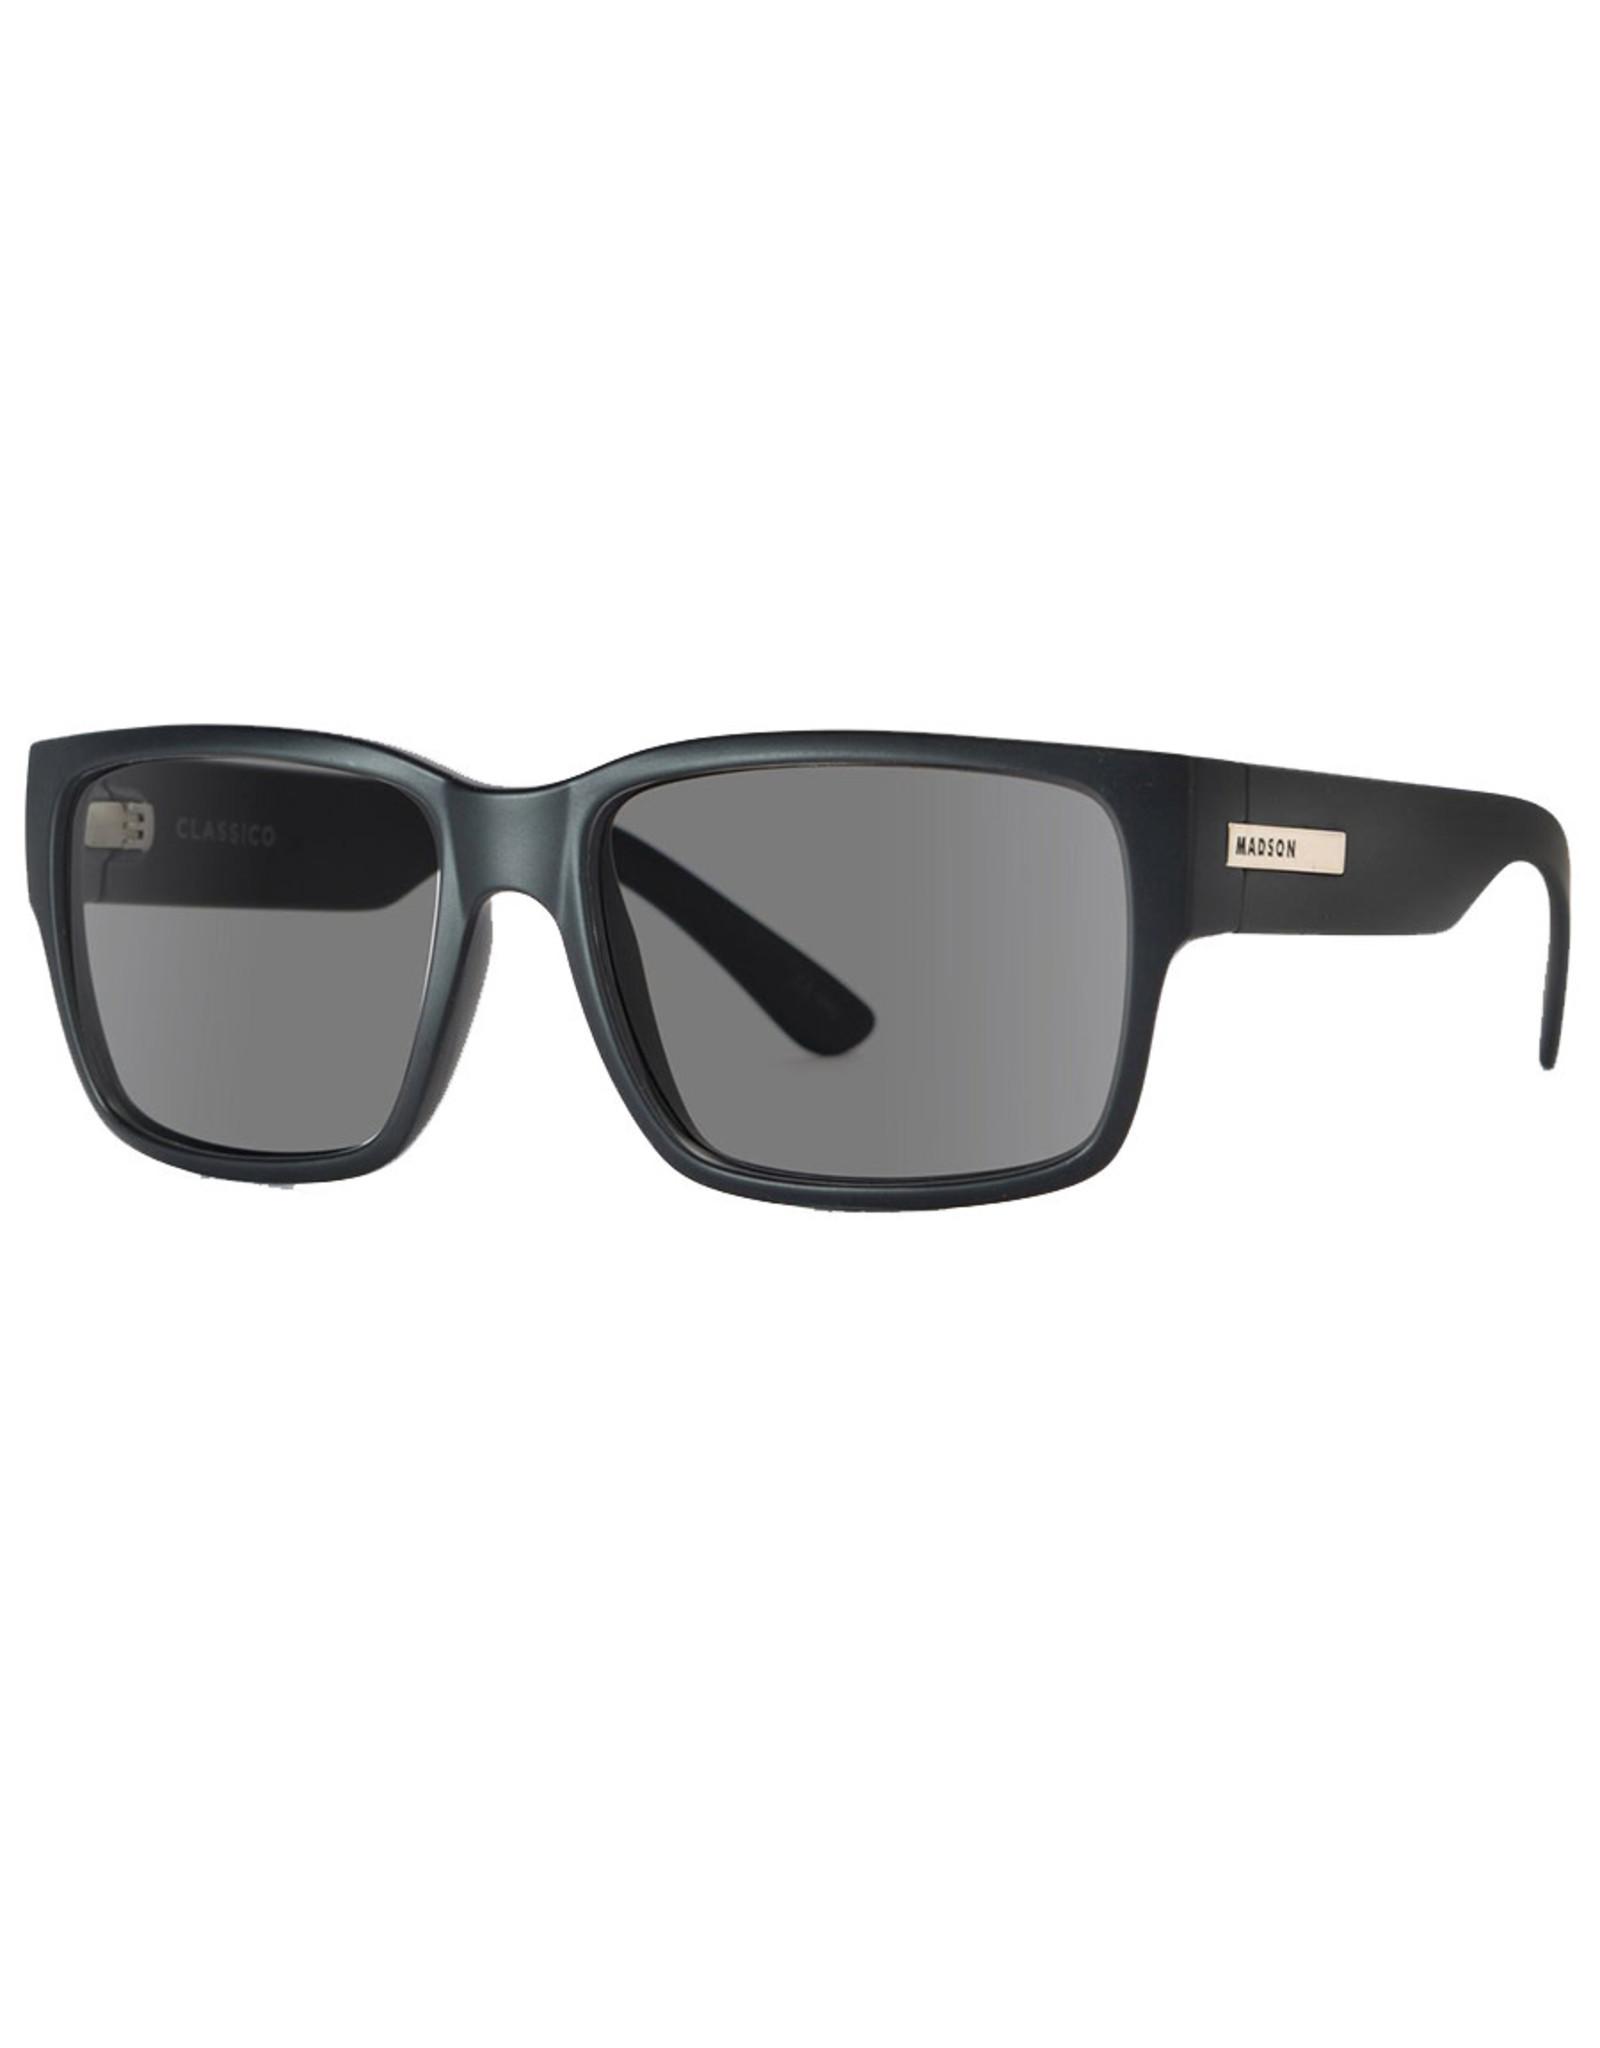 Madson Madson Sunglasses Classico (Black Matte/Grey Polarized Lens)